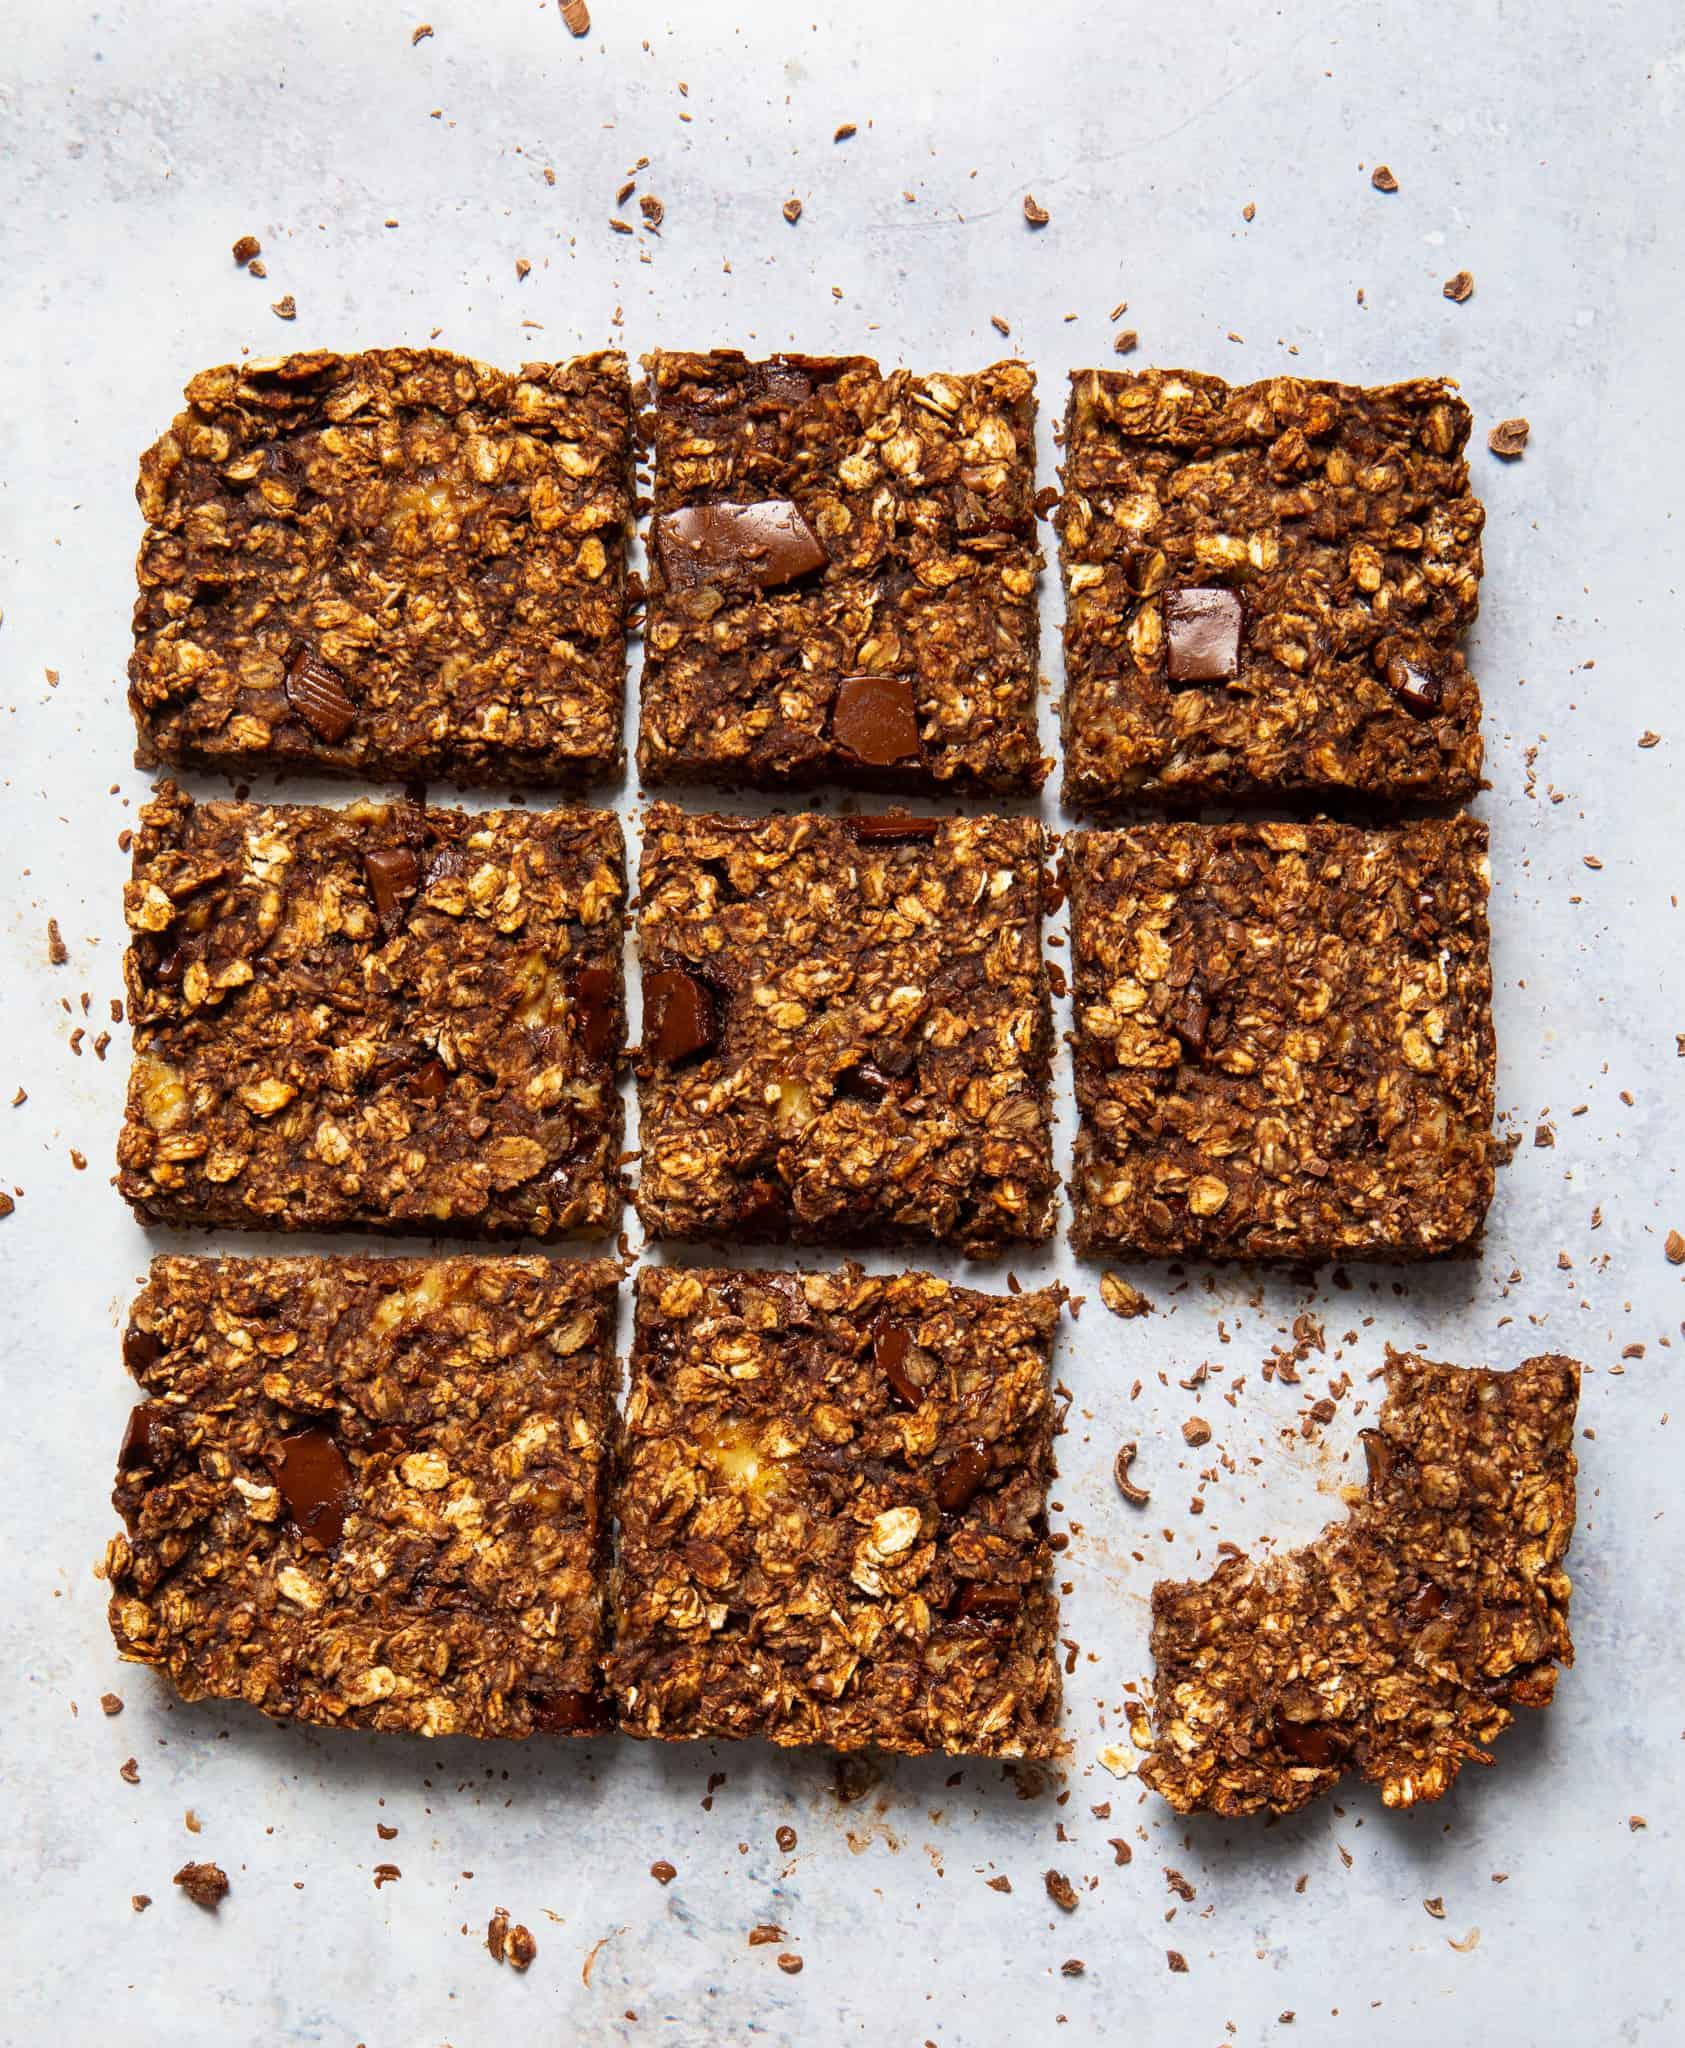 5 Ingredient Chocolate Flapjacks - gluten-free & vegan ready in 20 mins!